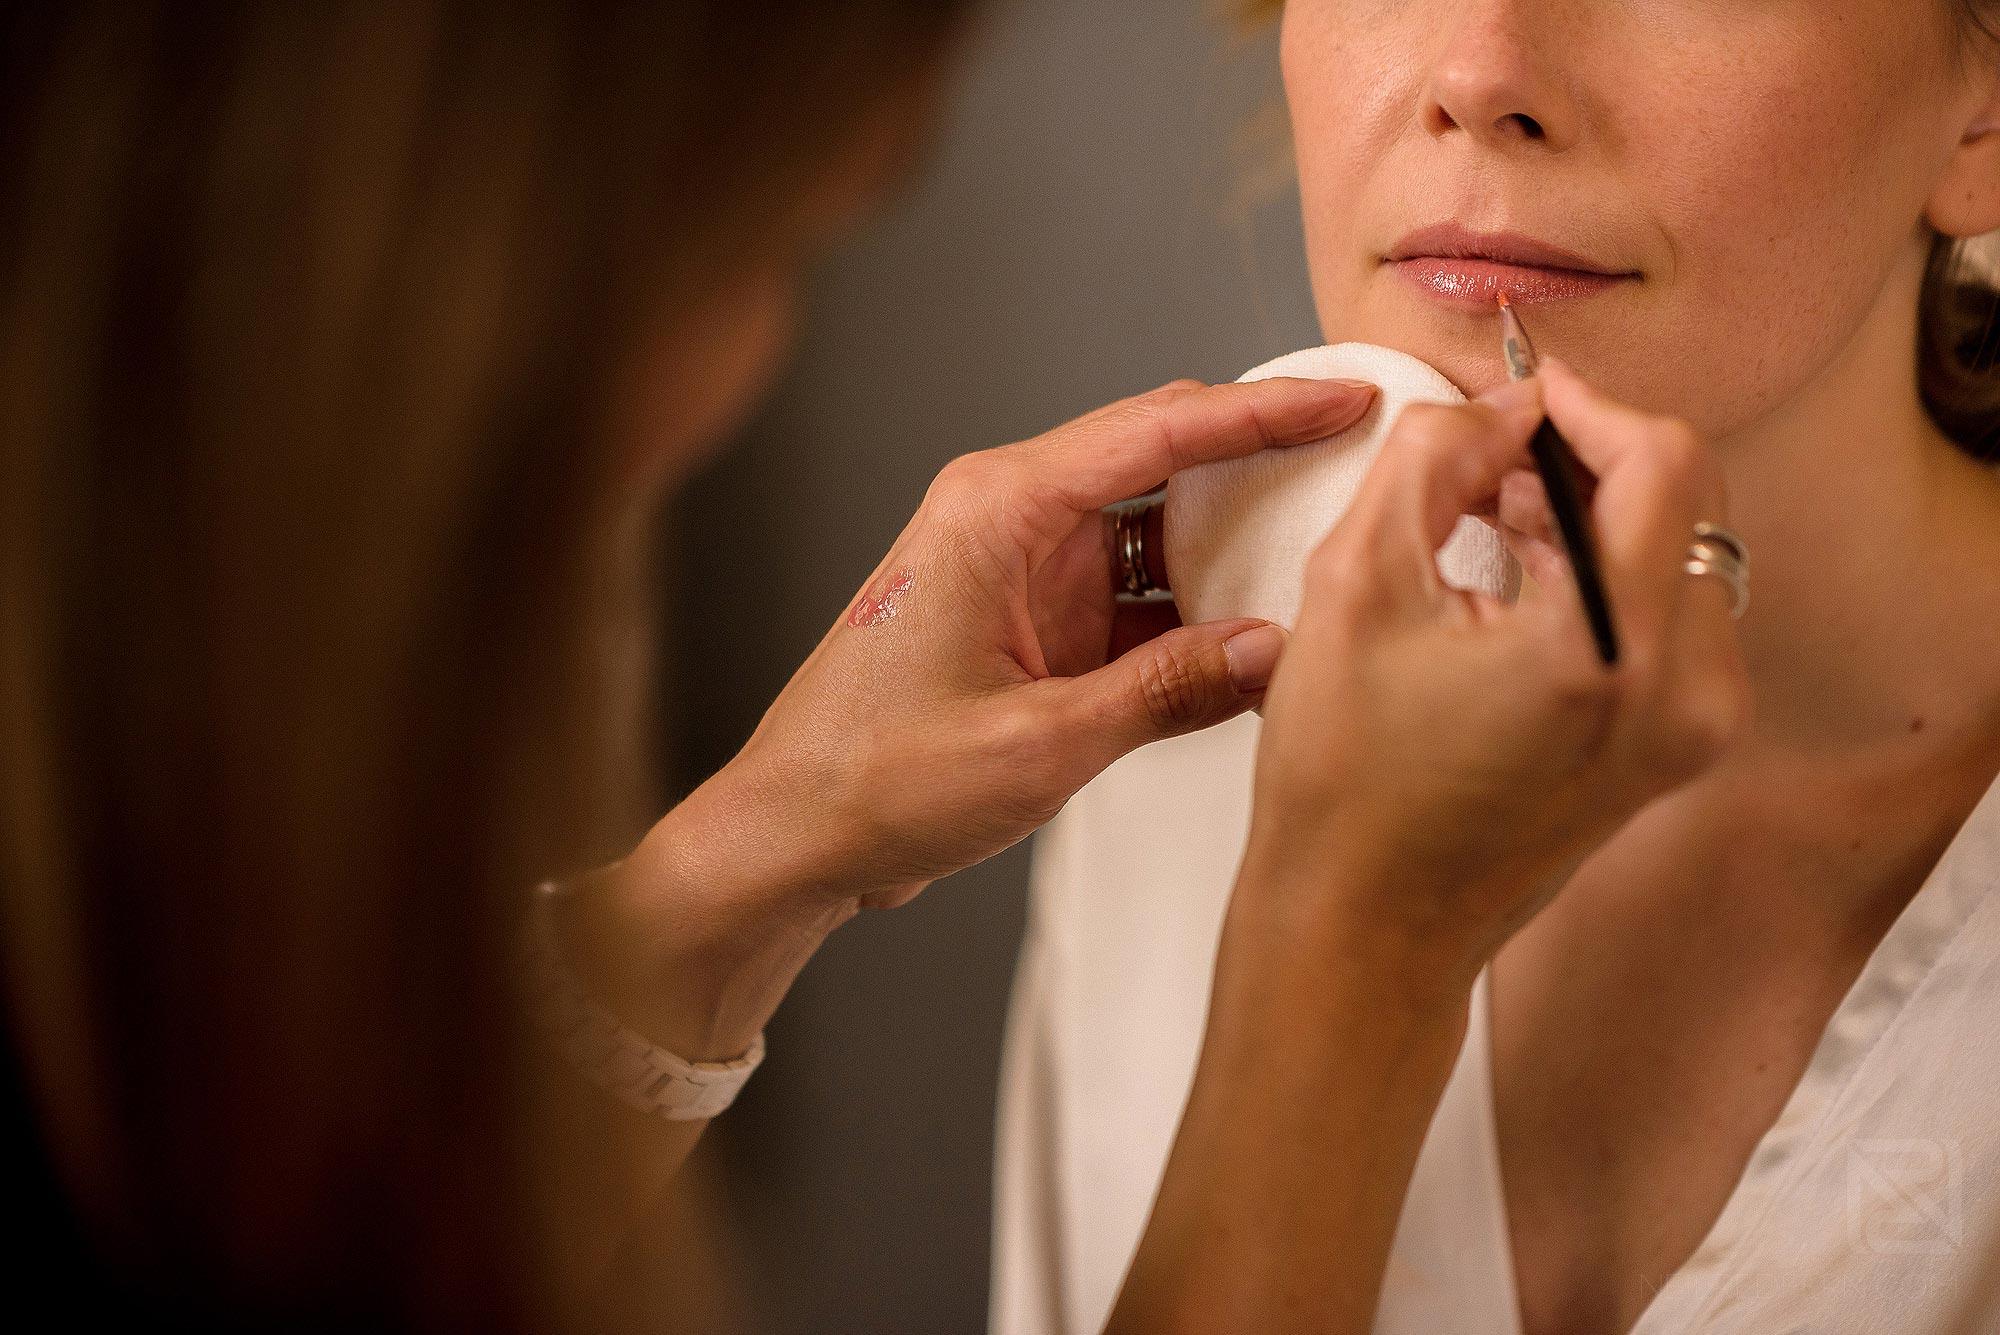 make-up artist applying lipstick to bride